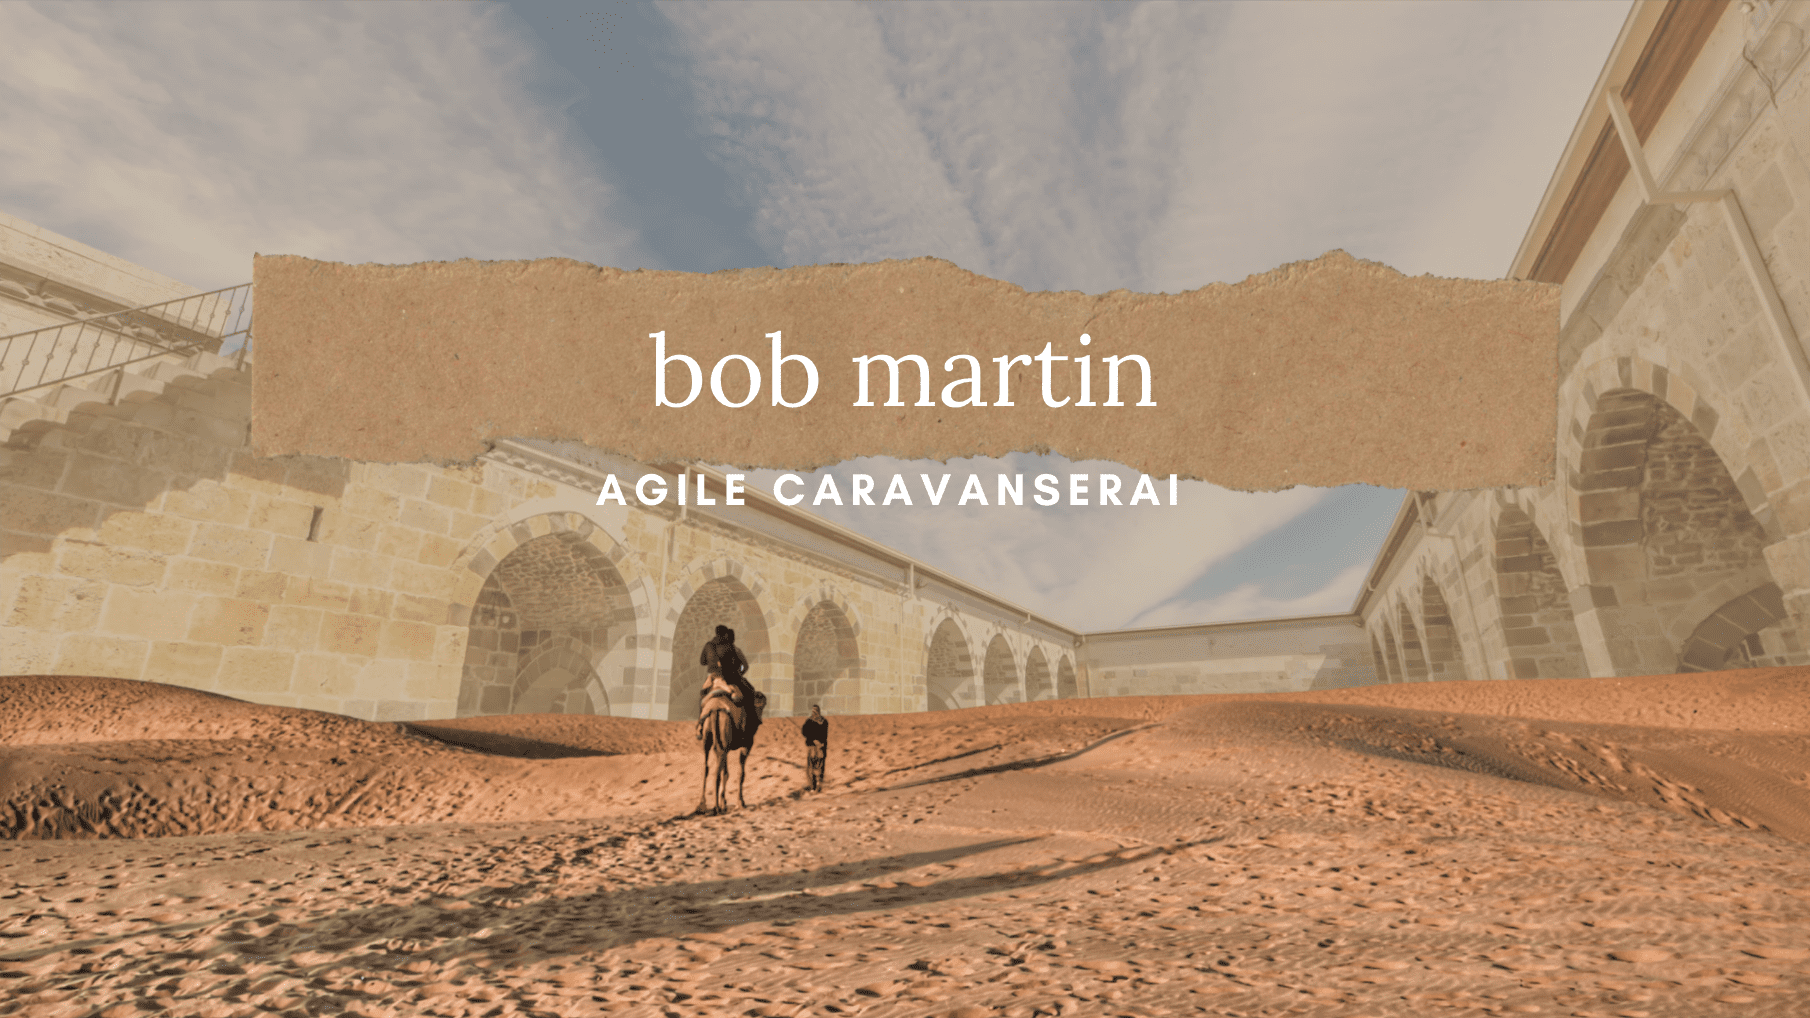 Agile Caravanserai: Bob Martin